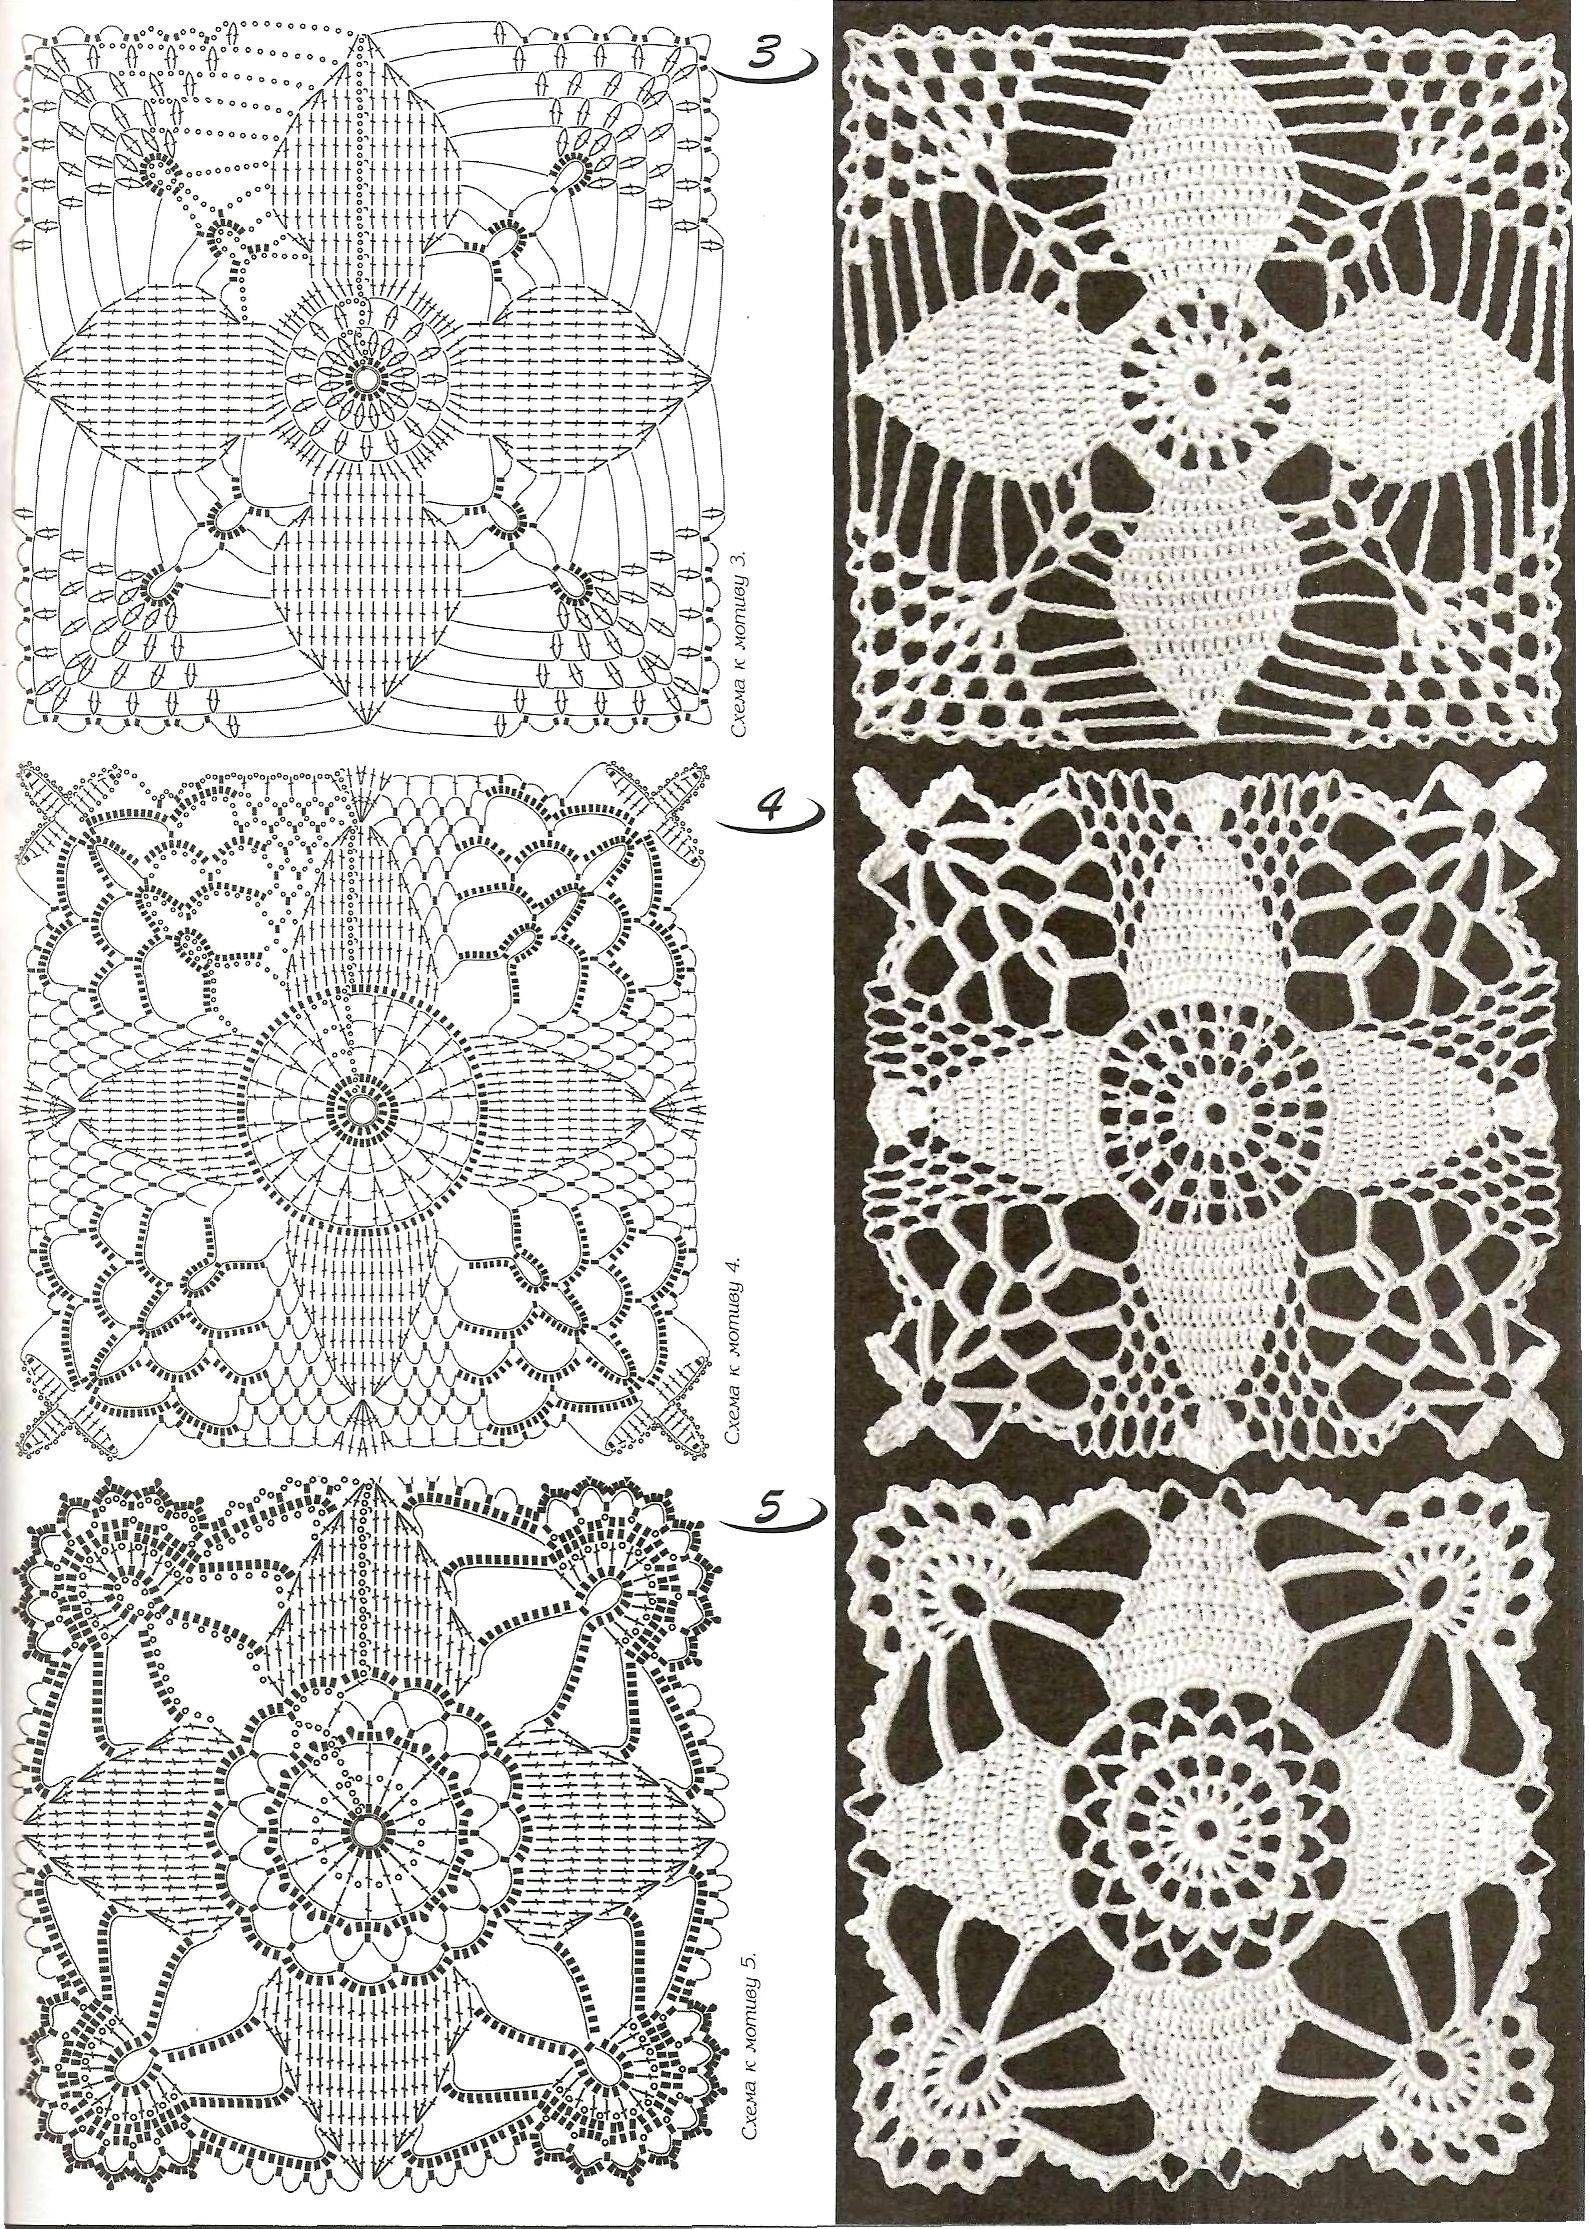 Motivos cuadrados | Crochet irlandés | Pinterest | Cuadrados ...